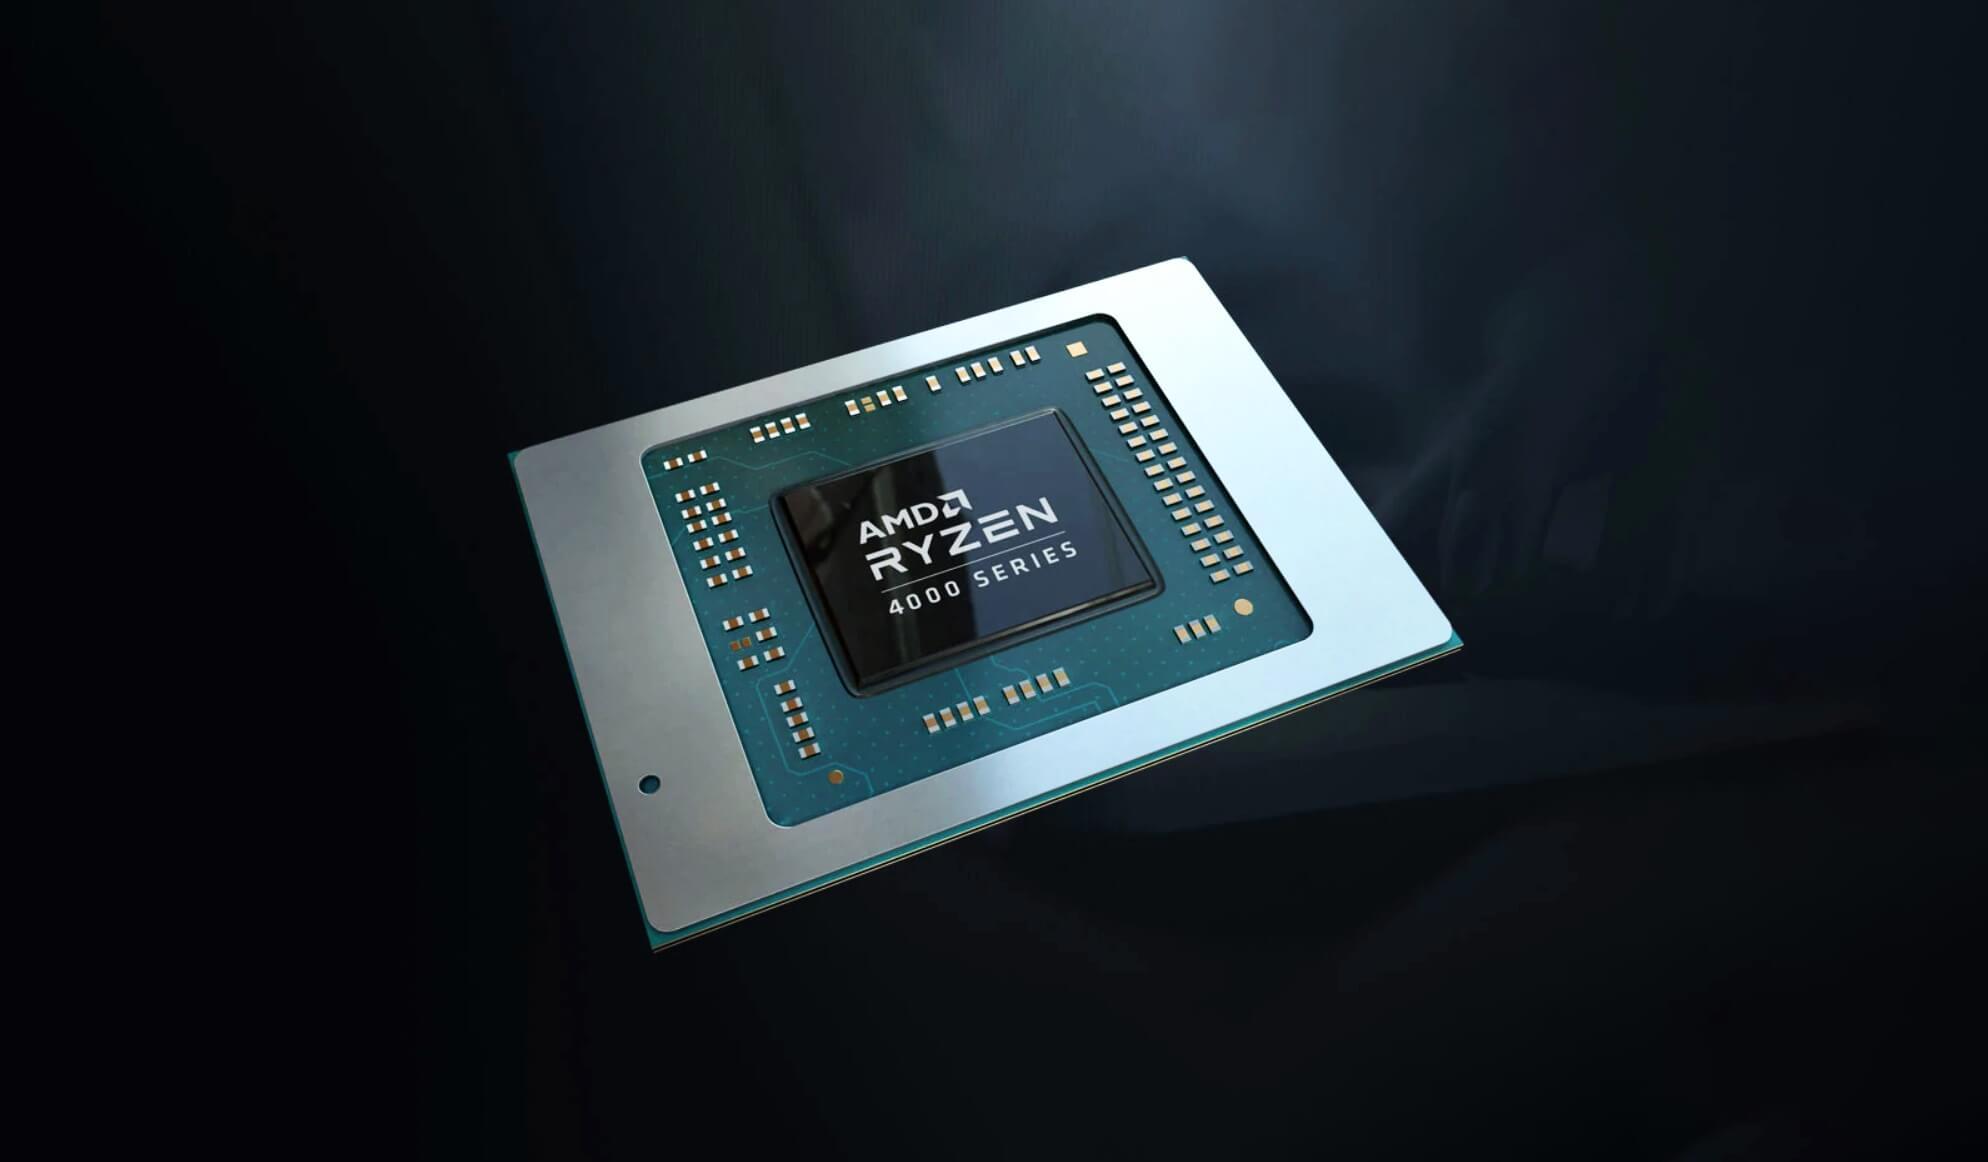 AMD Renoir Ryzen 4000 APUs